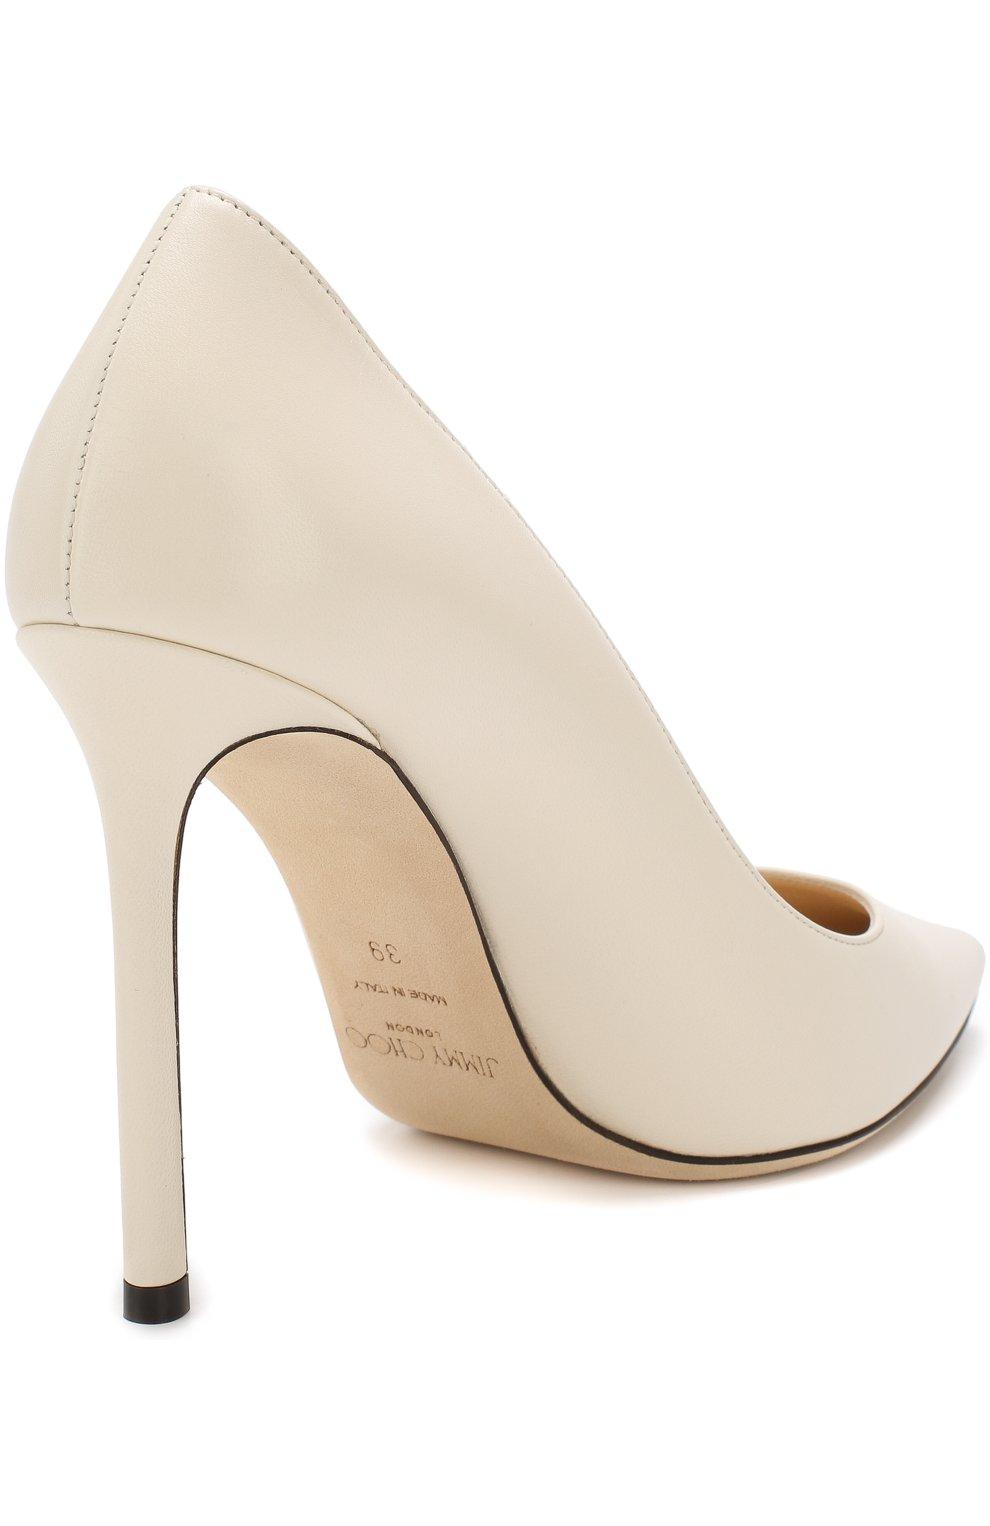 Женские кожаные туфли romy 100 на шпильке JIMMY CHOO белого цвета, арт. R0MY 100/KID   Фото 4